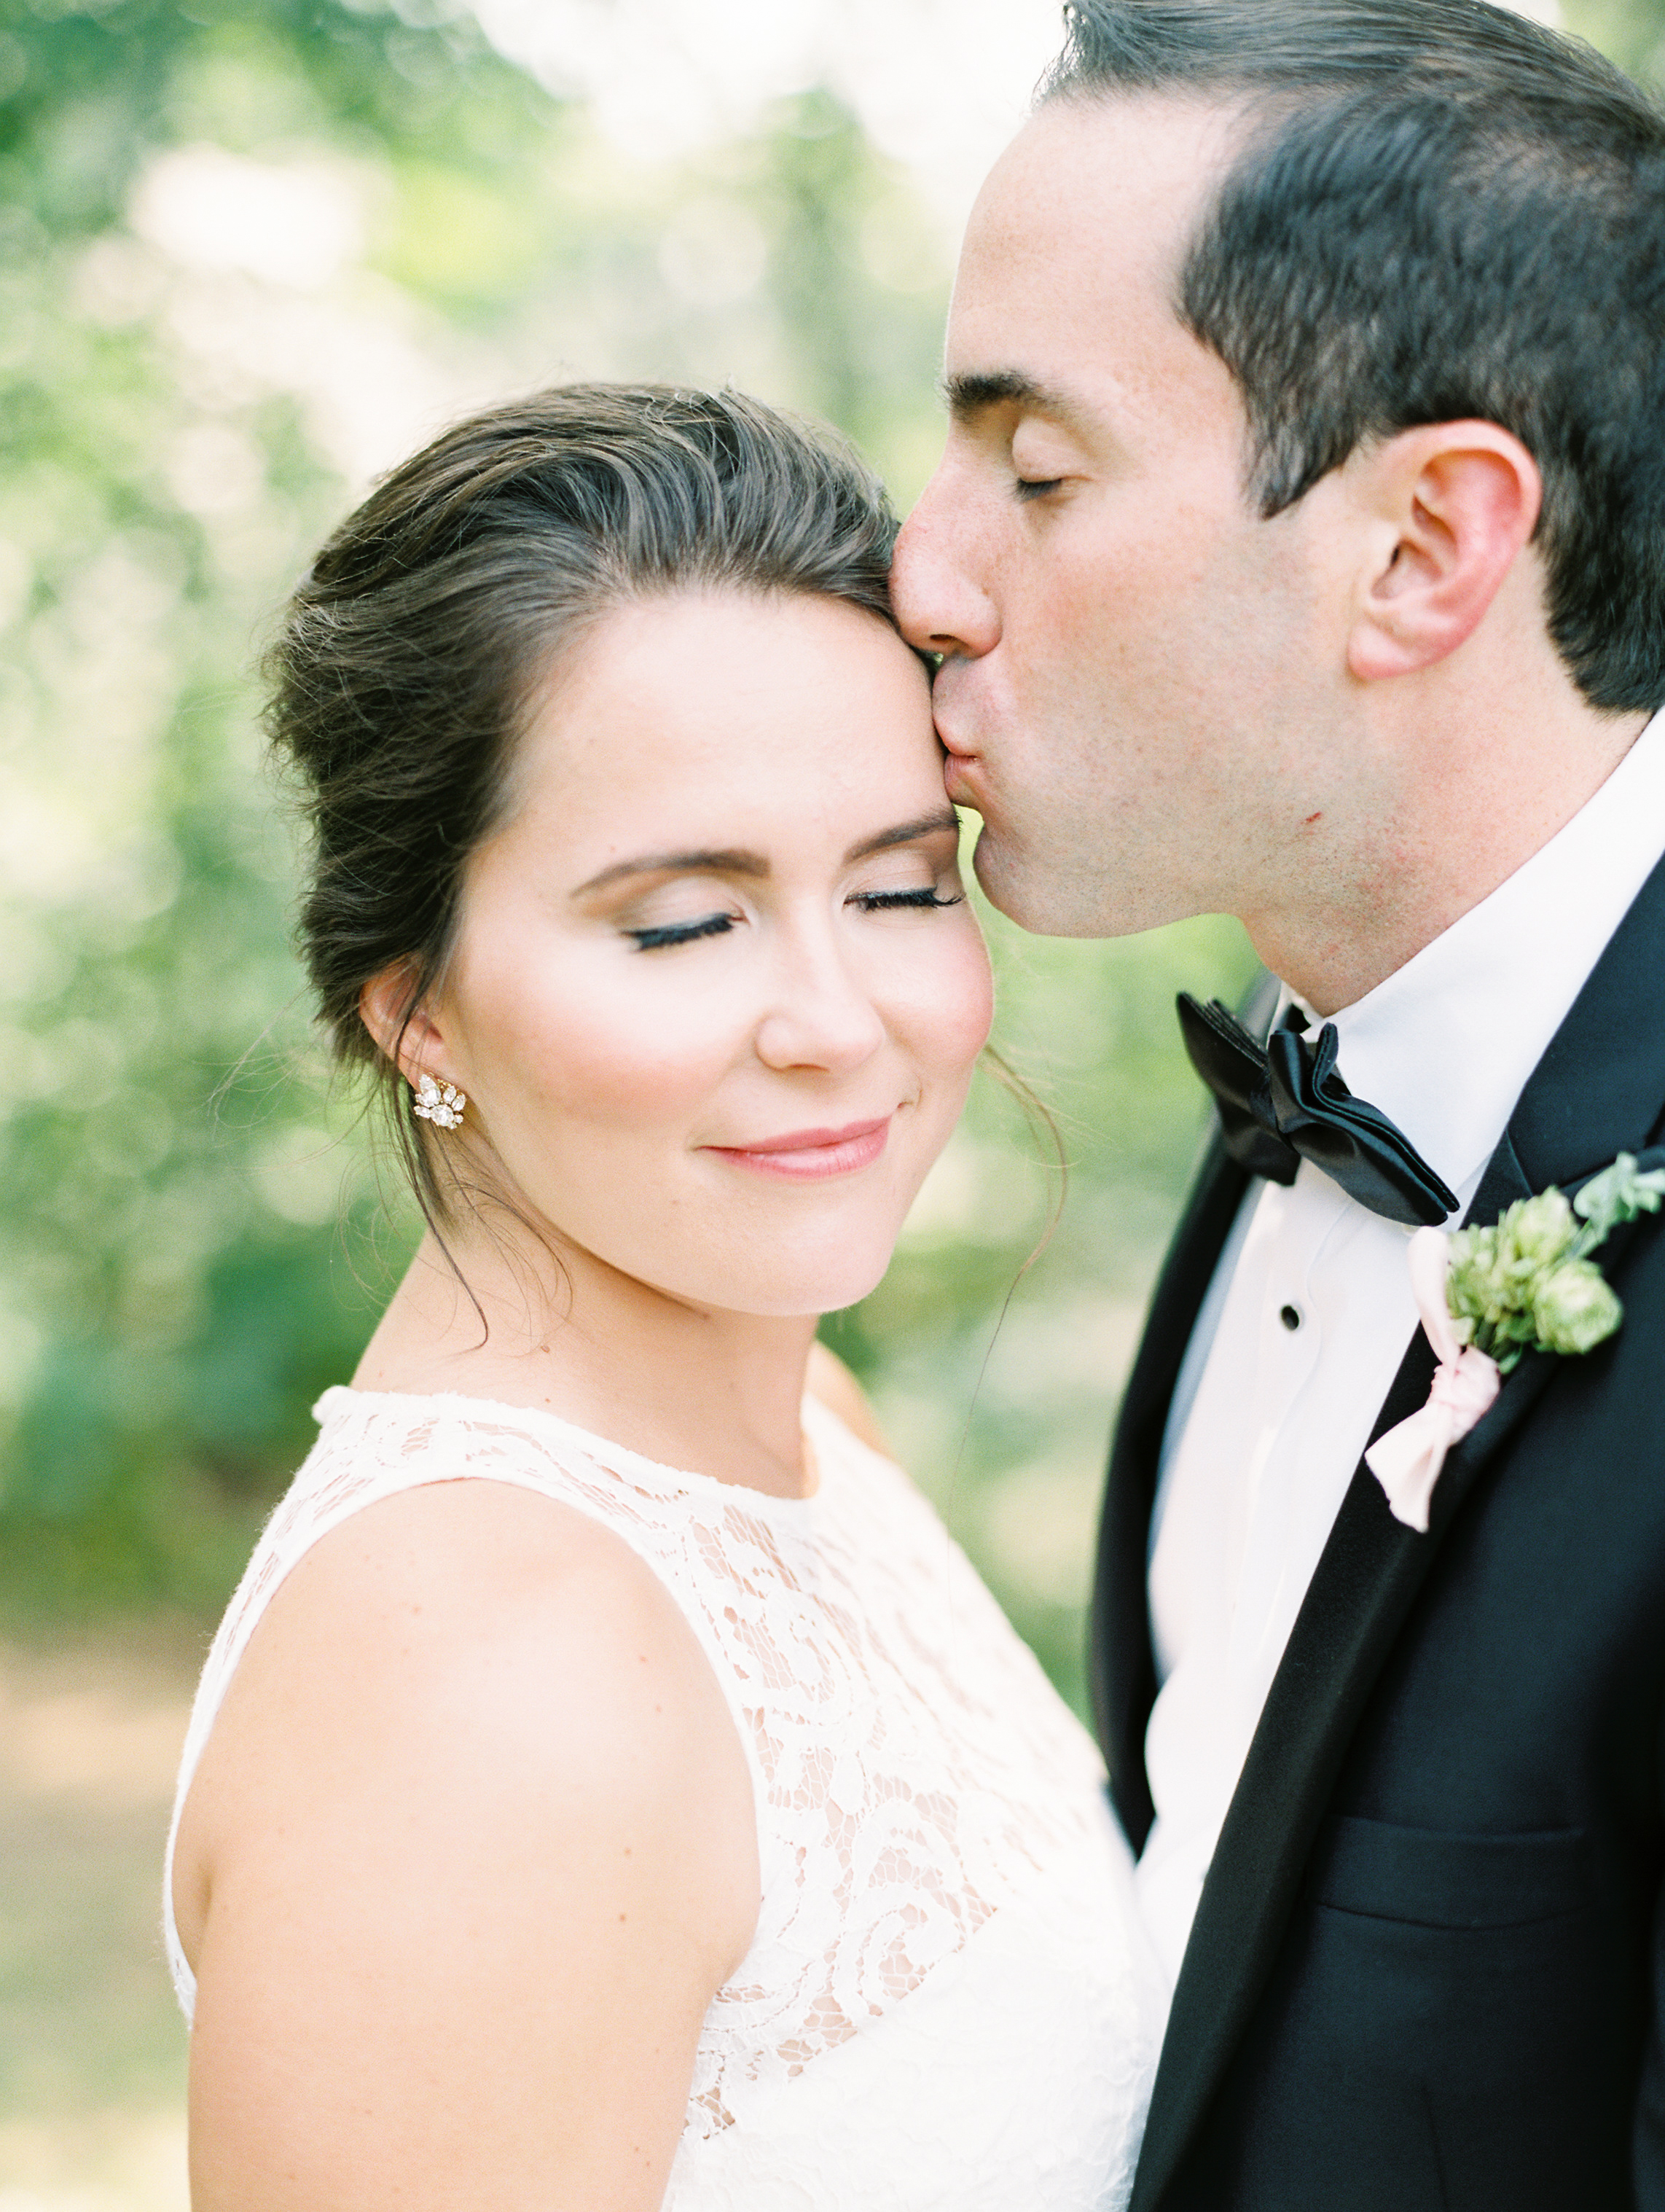 Zoller+Wedding+Bridal+Partyf-12.jpg